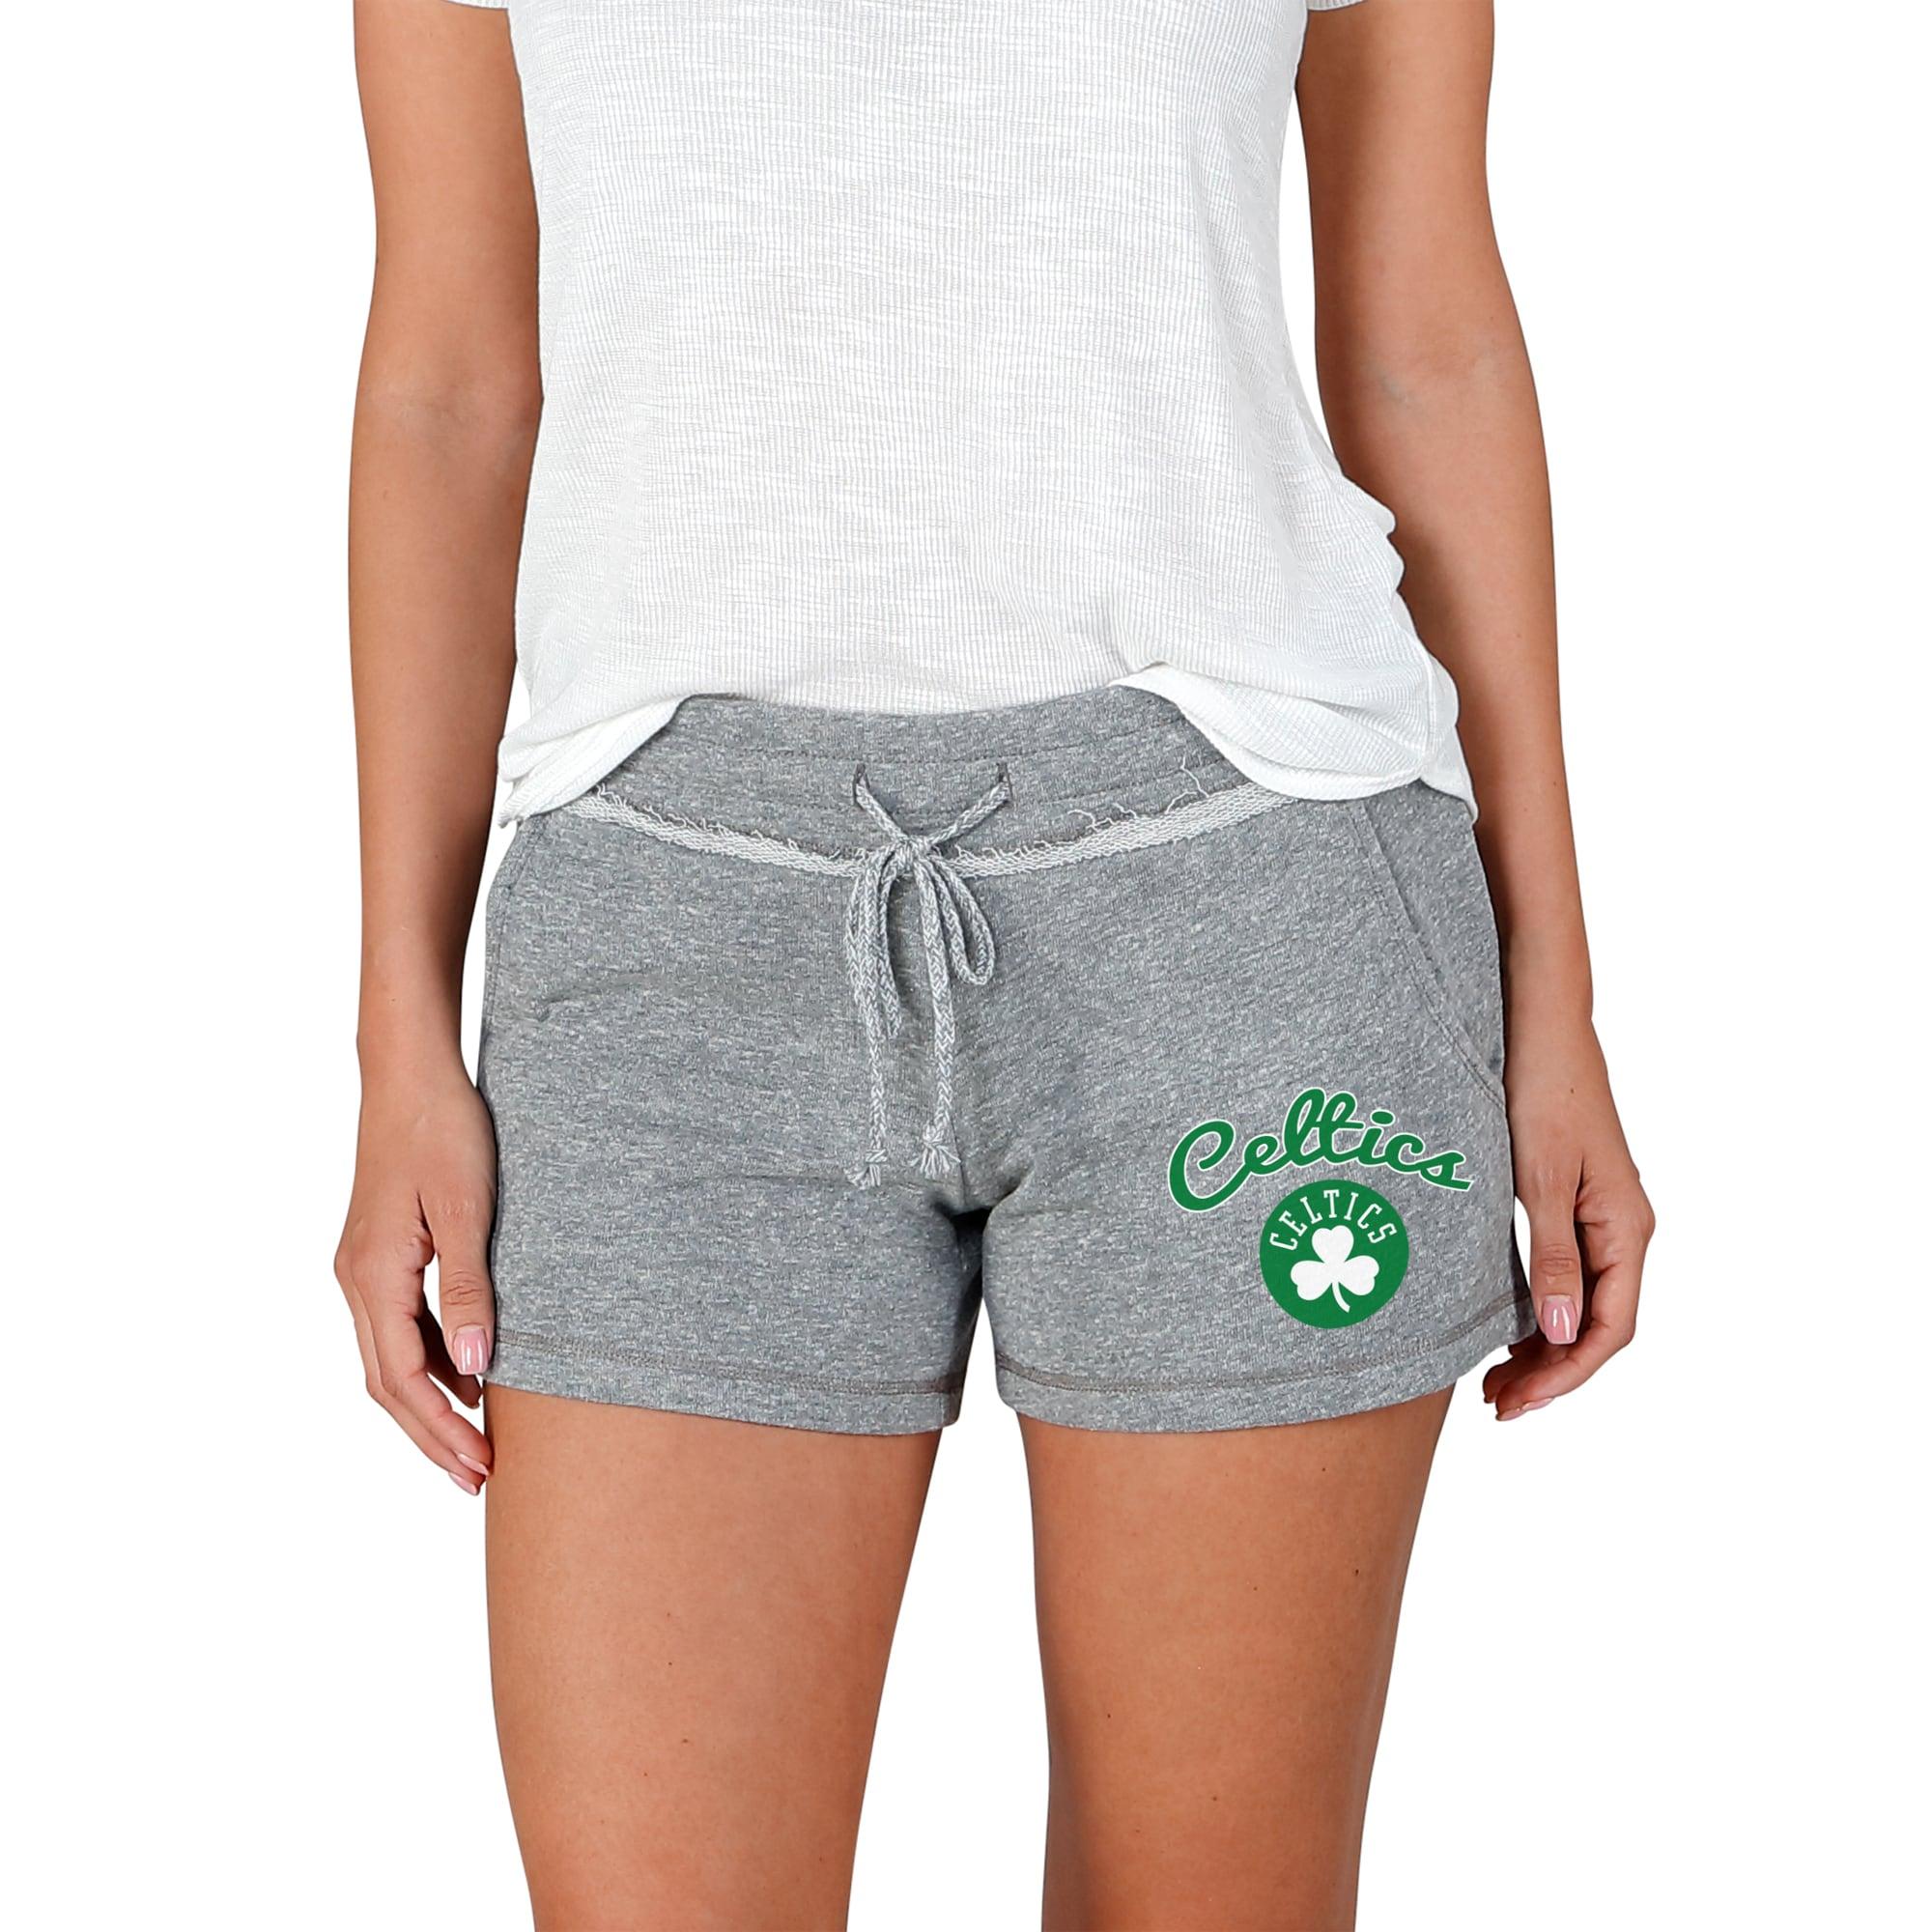 Boston Celtics Concepts Sport Women's Mainstream Terry Shorts - Gray